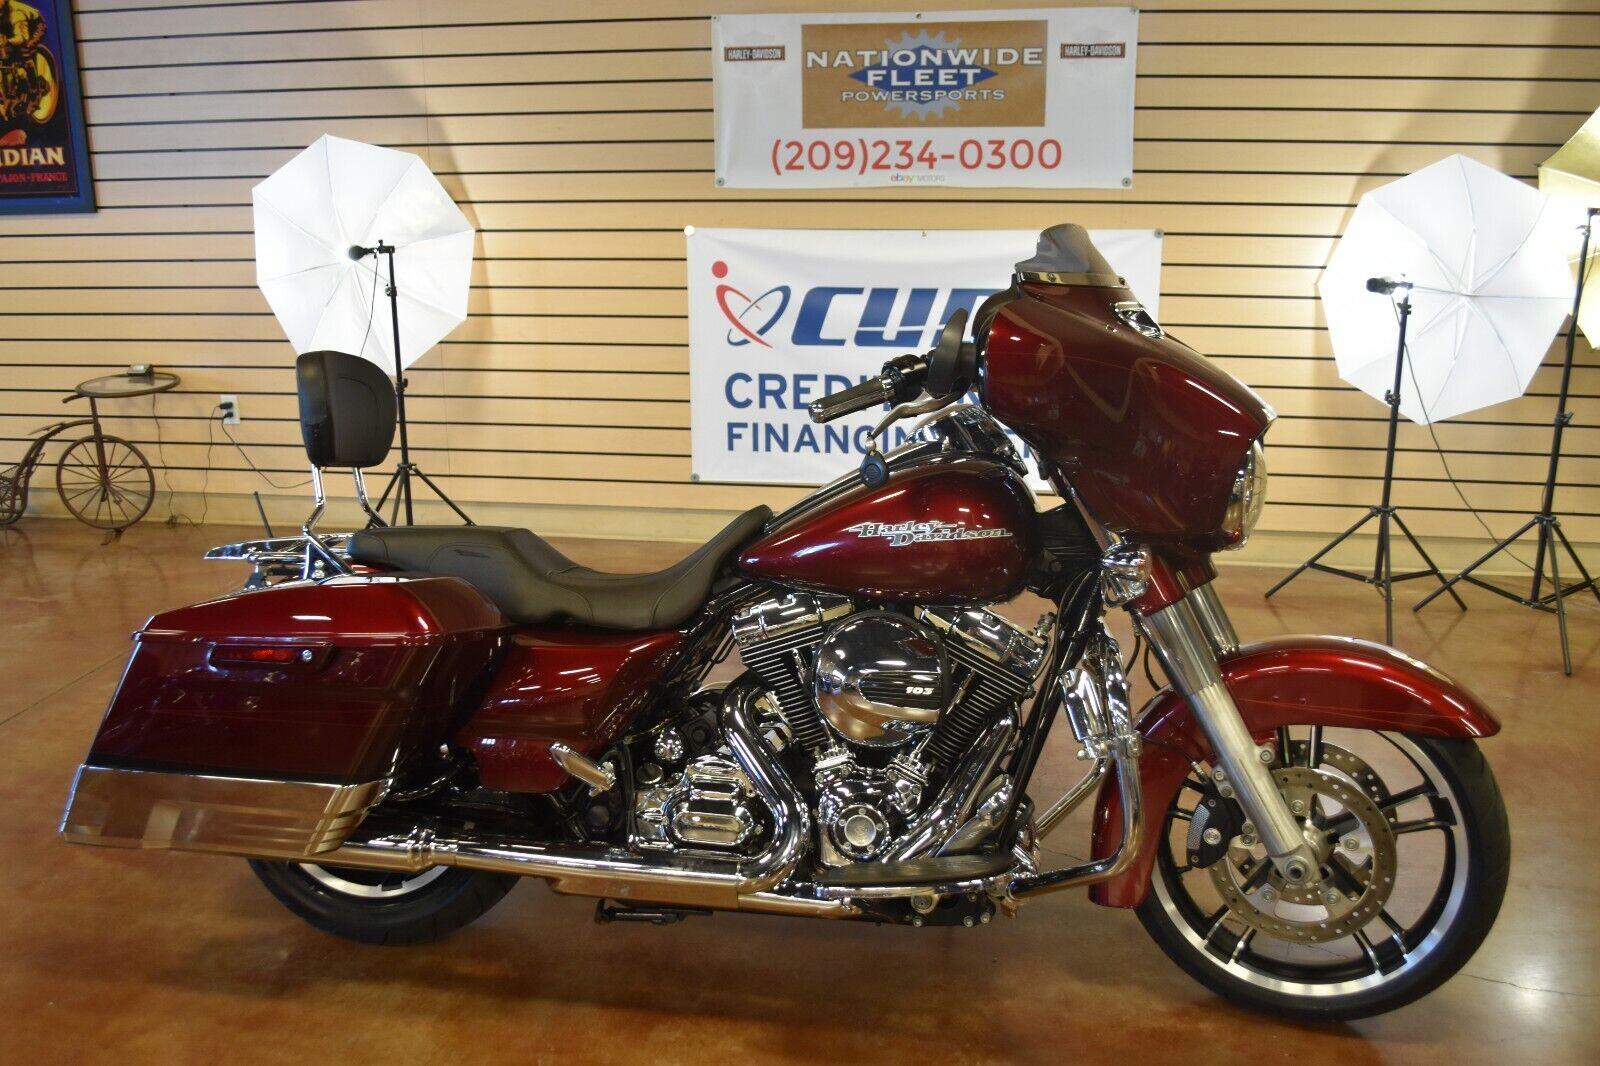 2014 Harley Davidson Street Glide Special FLHXS Custom 103 Touring NO RESERVE